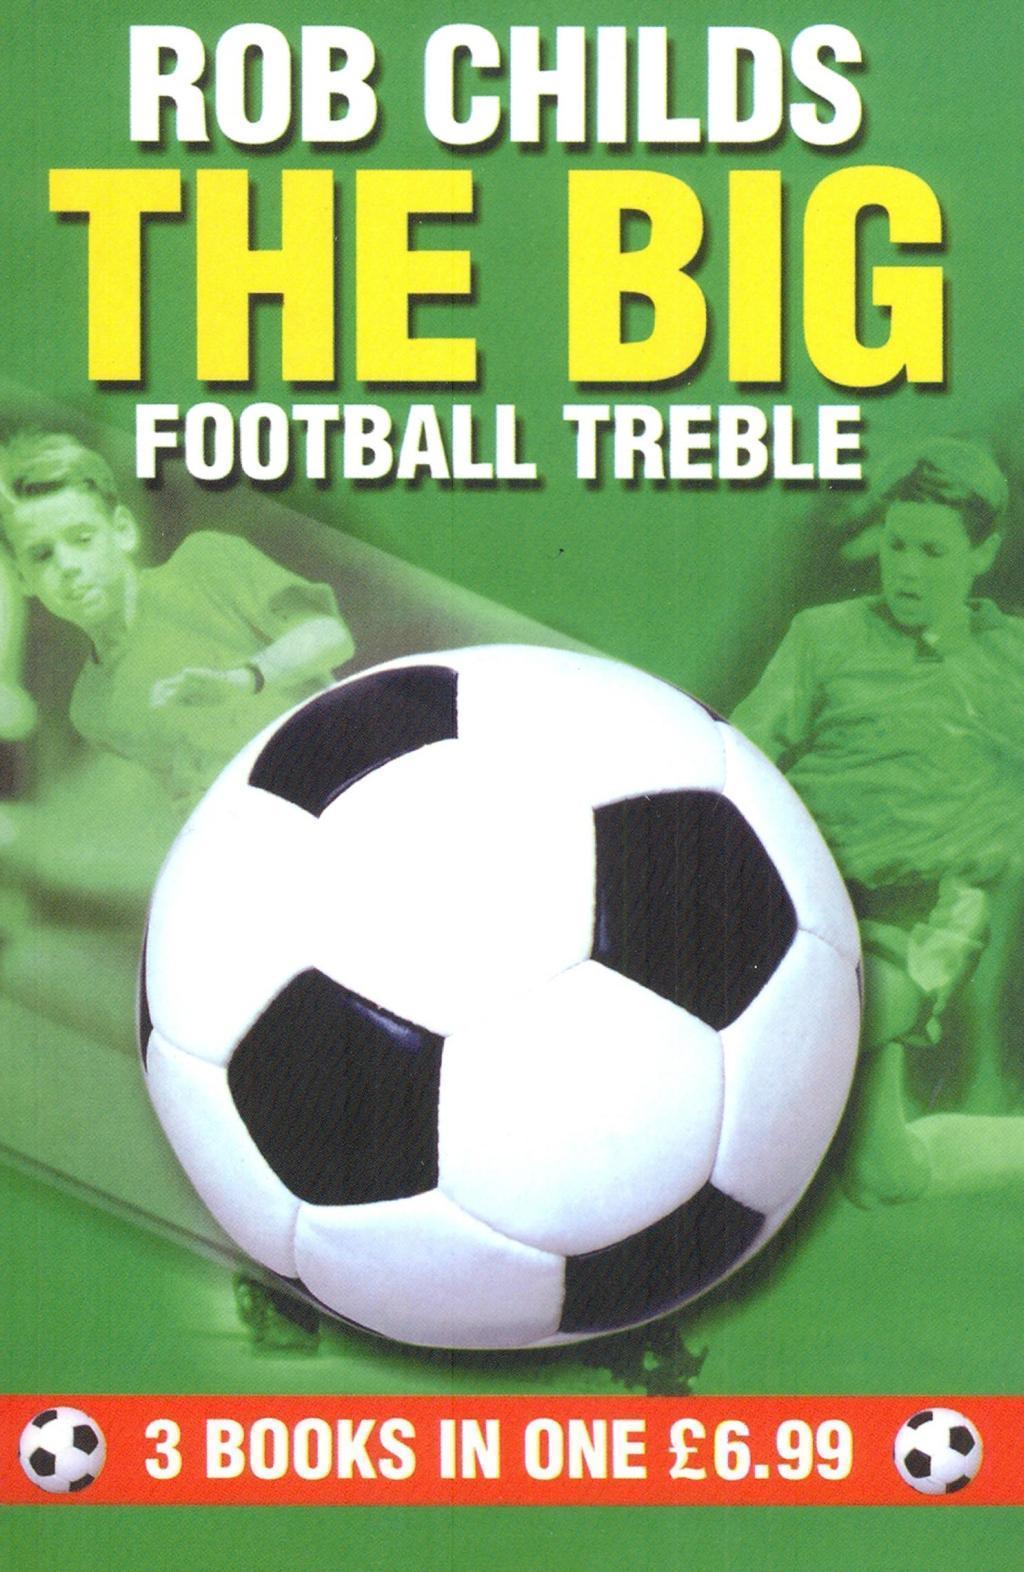 The Big Football Treble